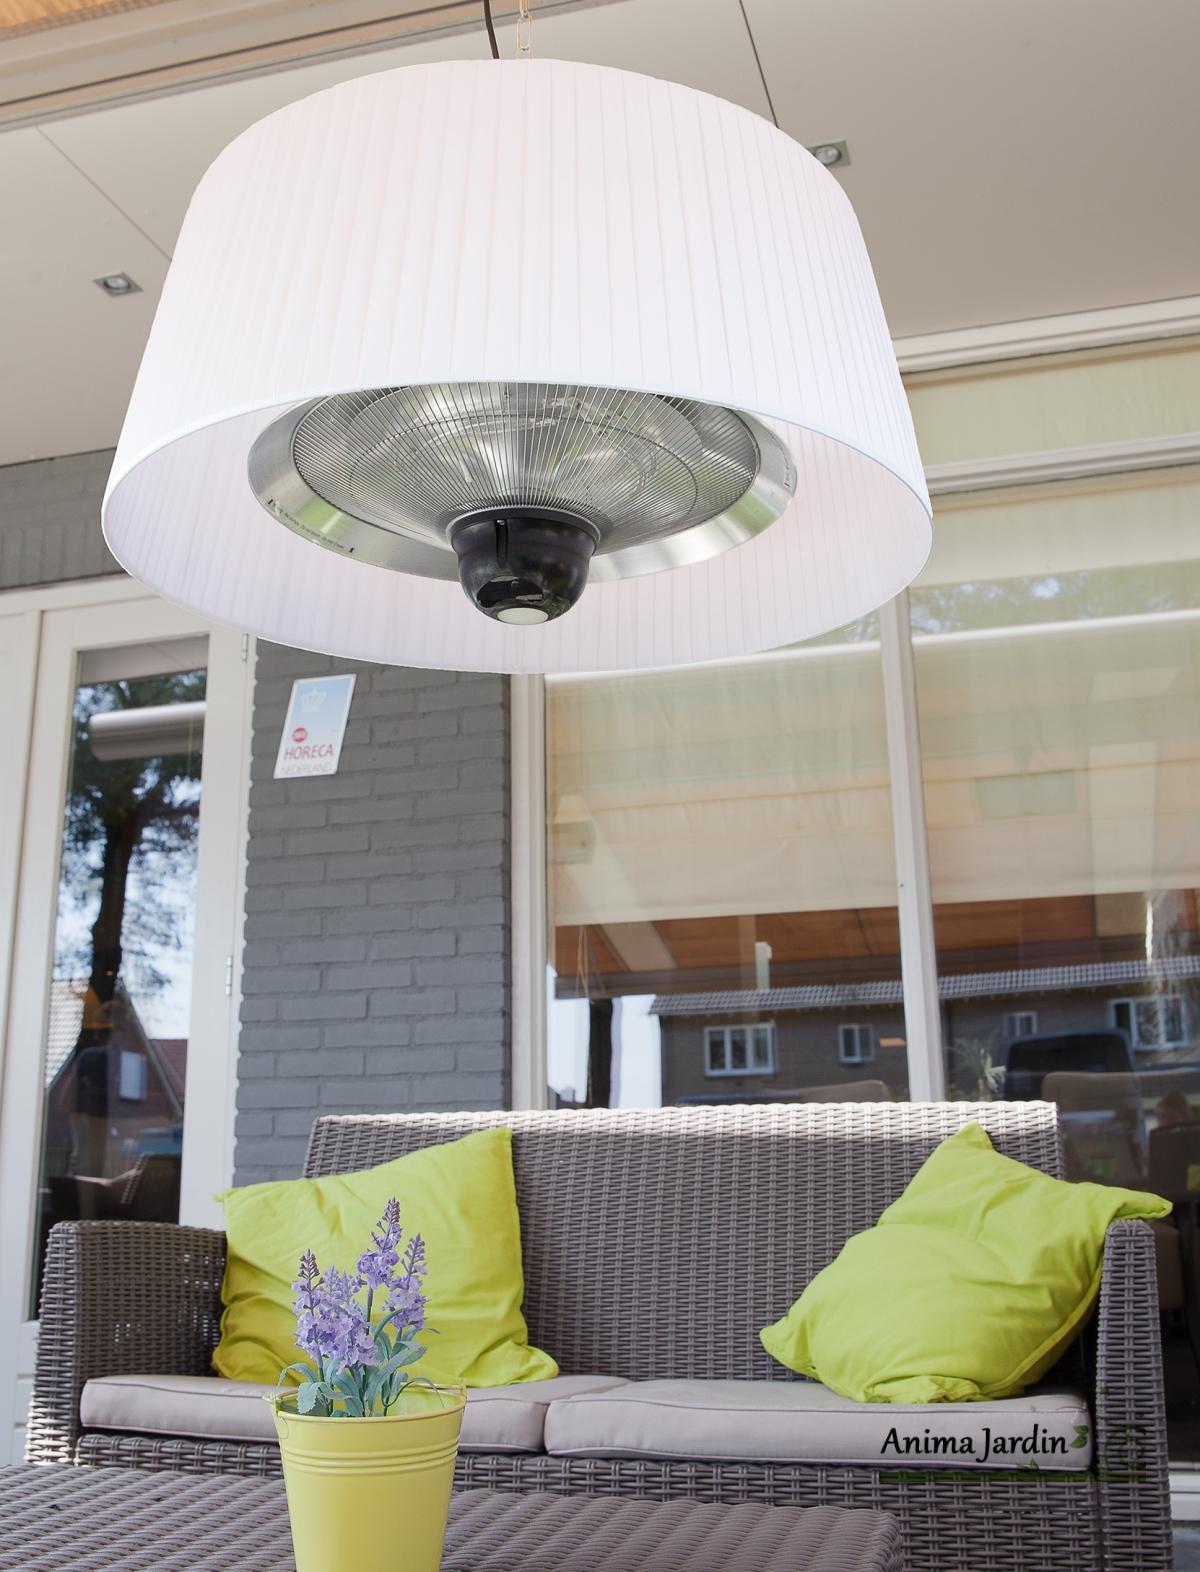 Lampe-chauffante-jardin-halogène-anima-jardin.fr